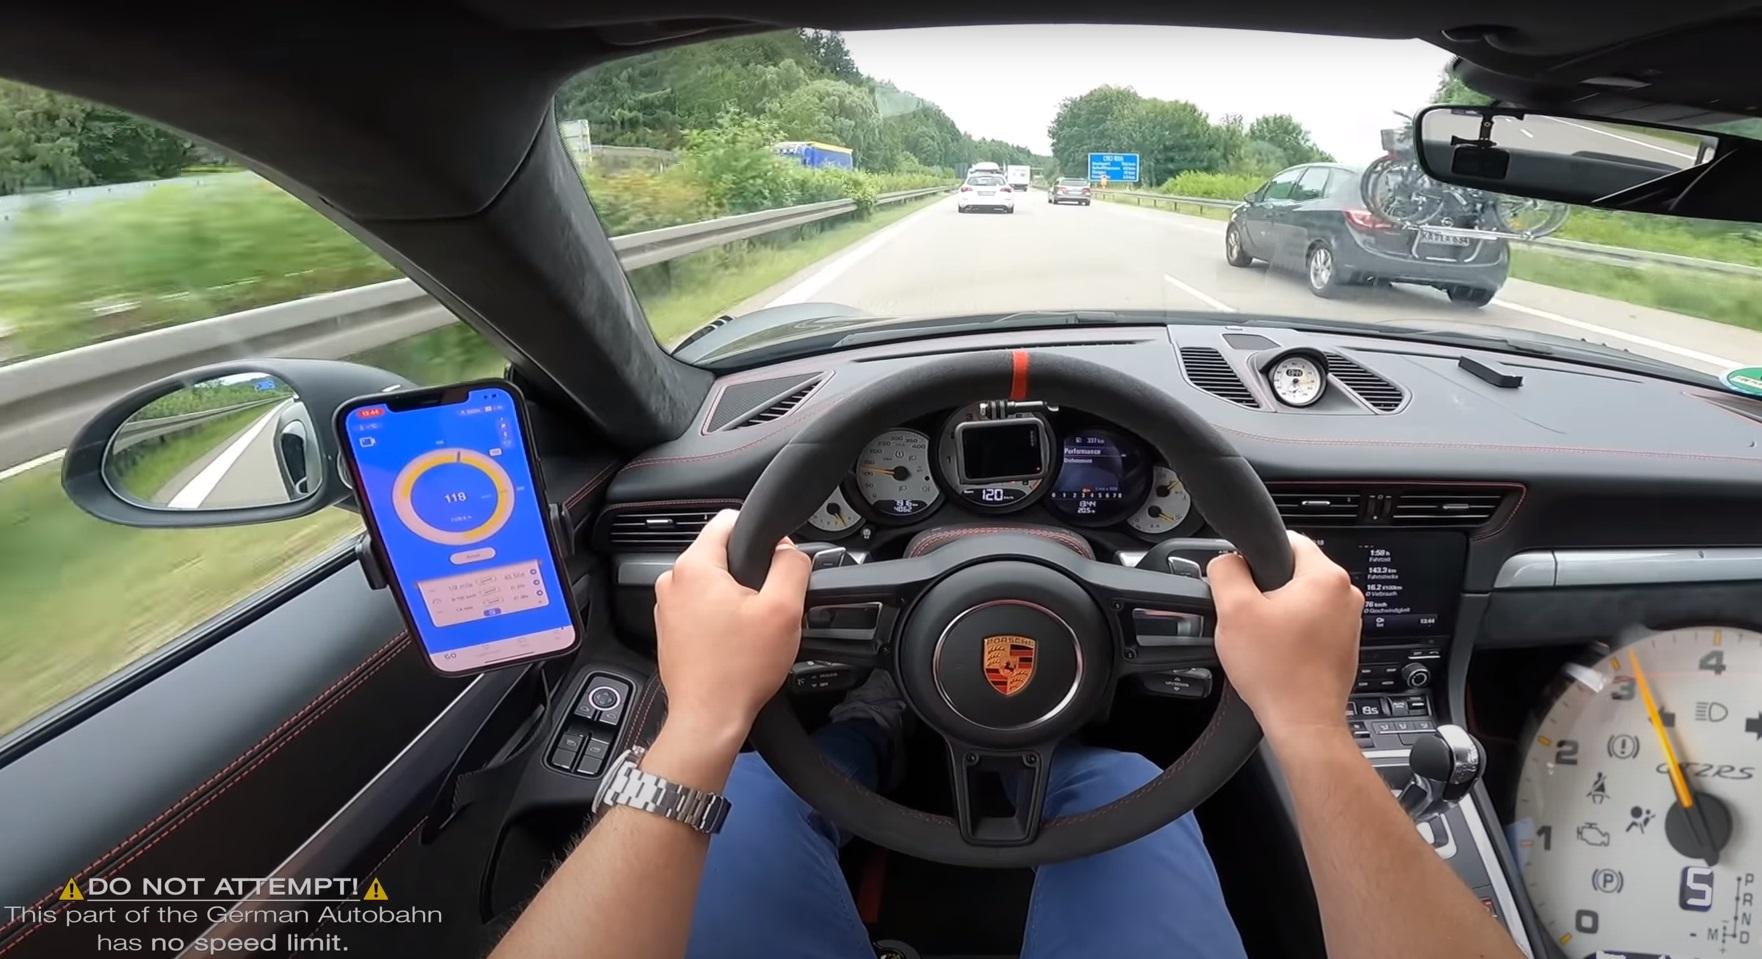 800HP Porsche 911 GT2 RS Goes for 217MPH (349KPH) Run on Busy Autobahn